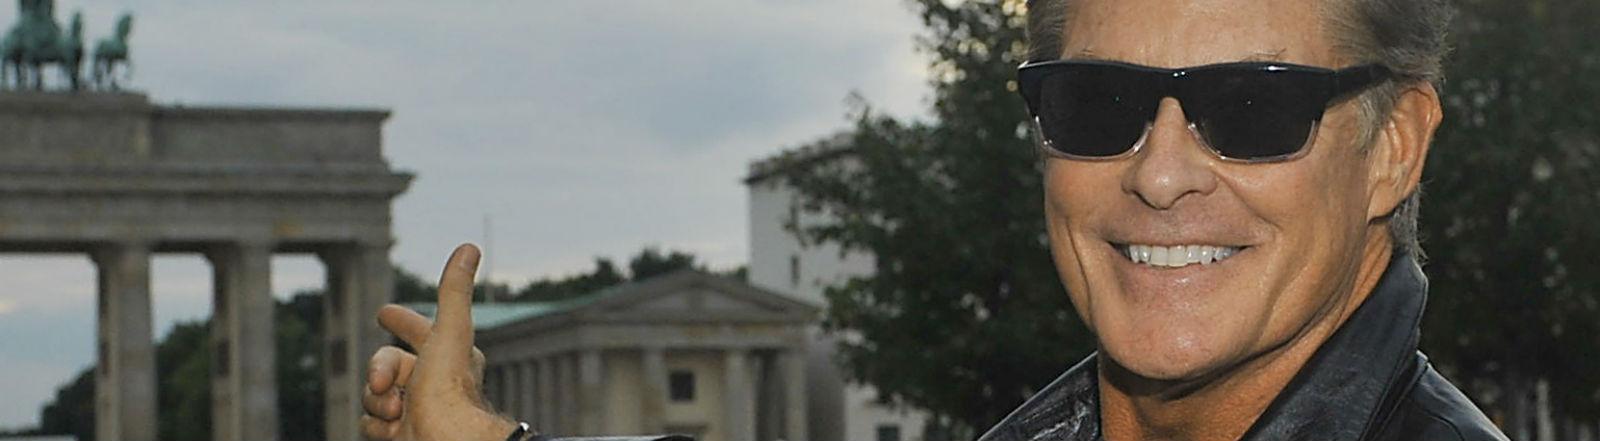 David Hasselhoff vor dem Brandenburger Tor. Bild: dpa